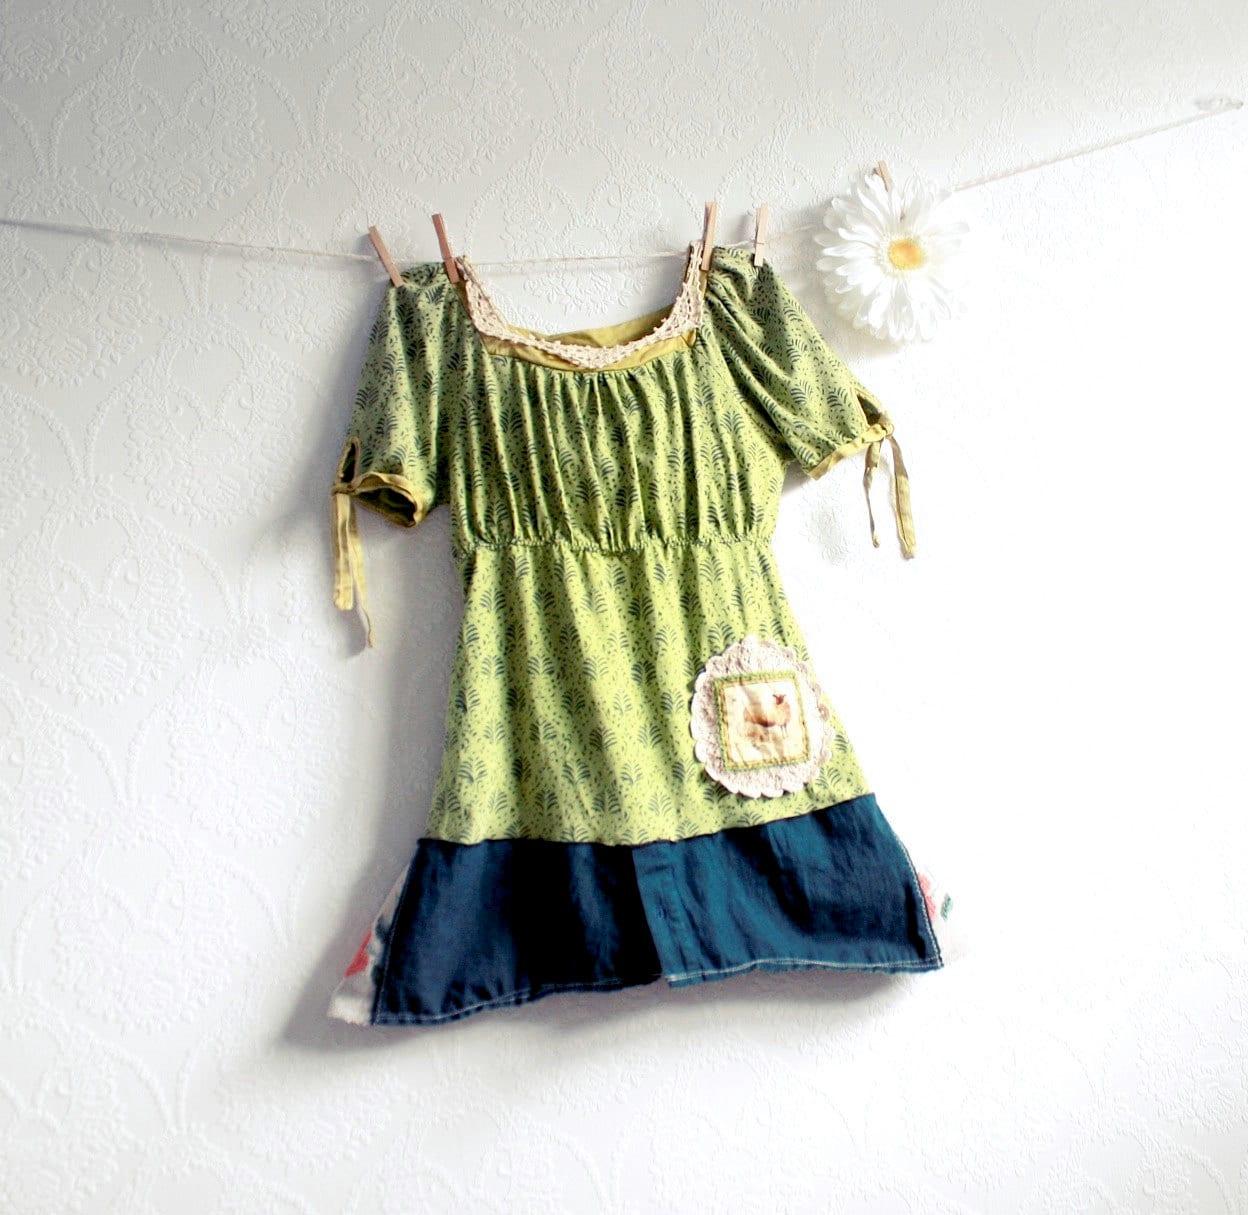 Eco Friendly Clothing Chartreuse Top Green Women's Shirt